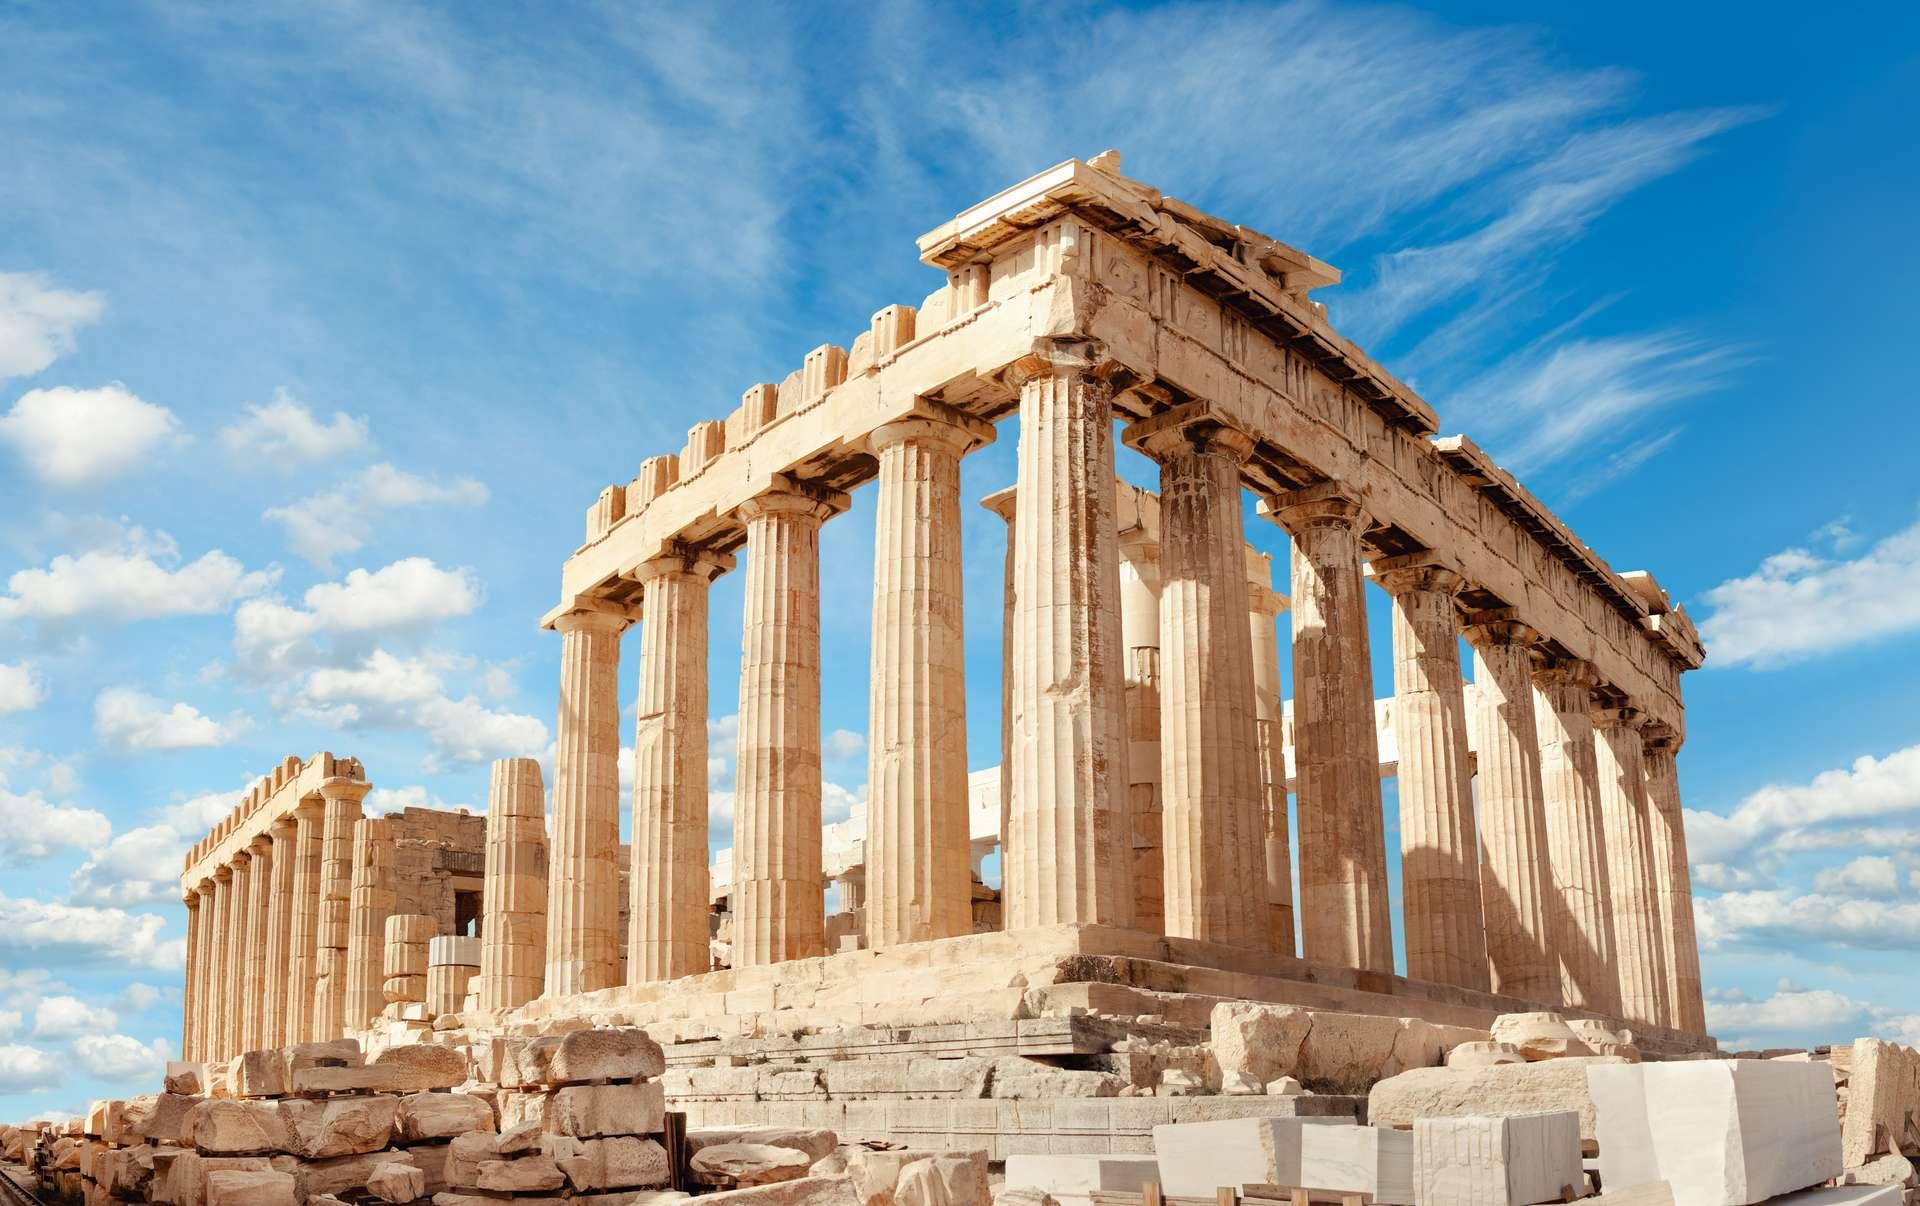 Griekenland Athene Acropolis Parthenon temple